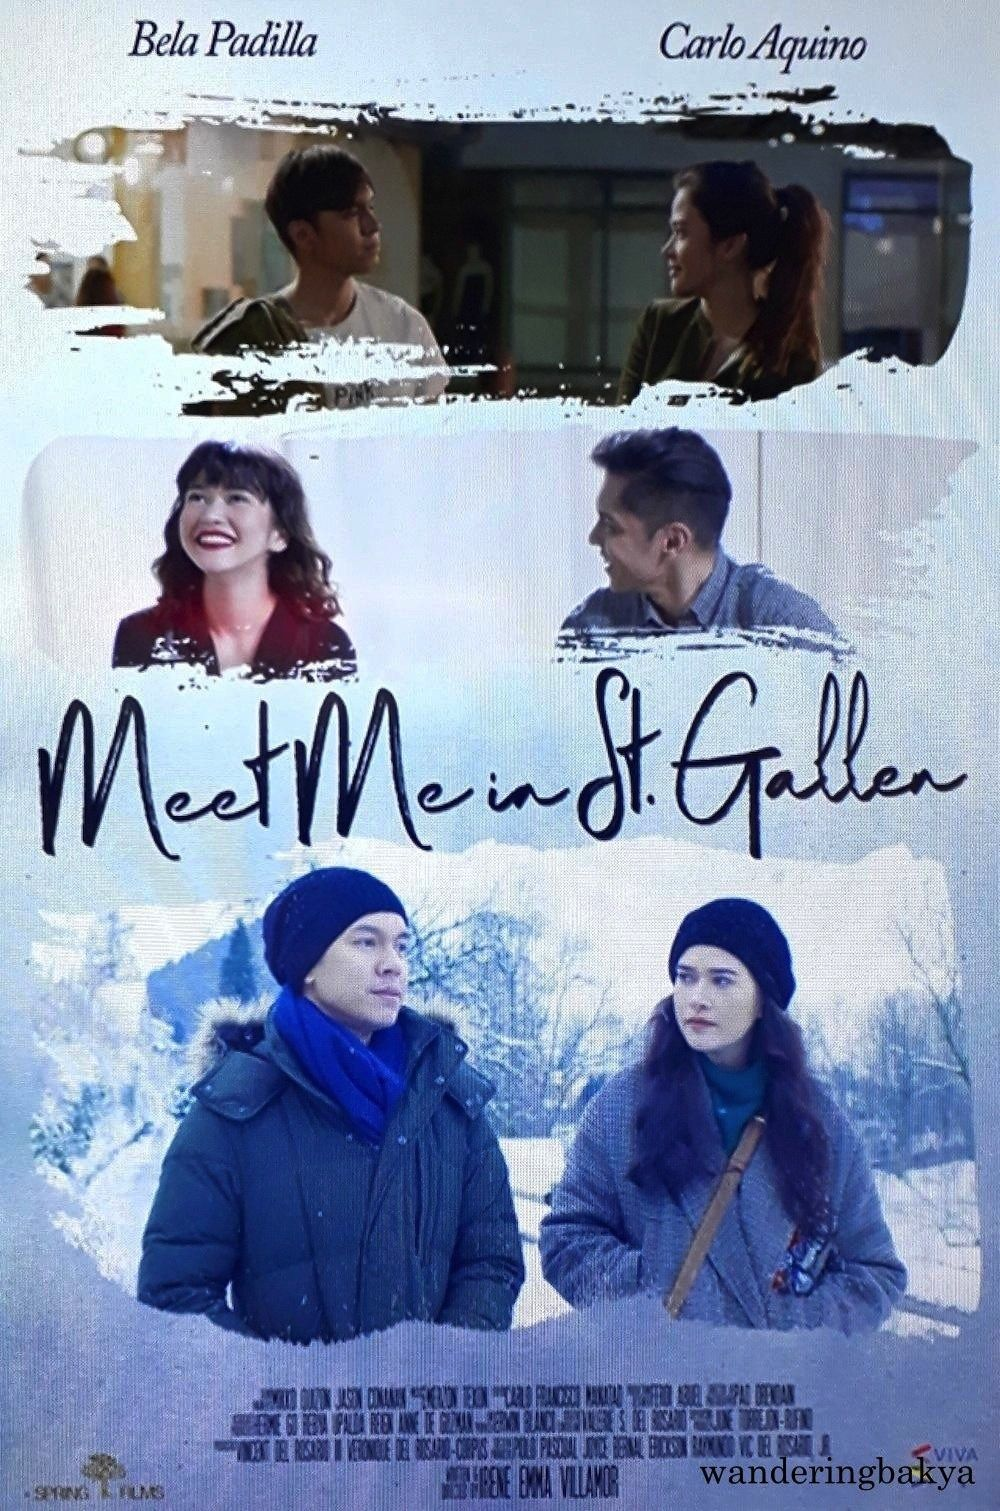 Meet Me In St Gallen 2018 A Beautiful Filipino Film Starring